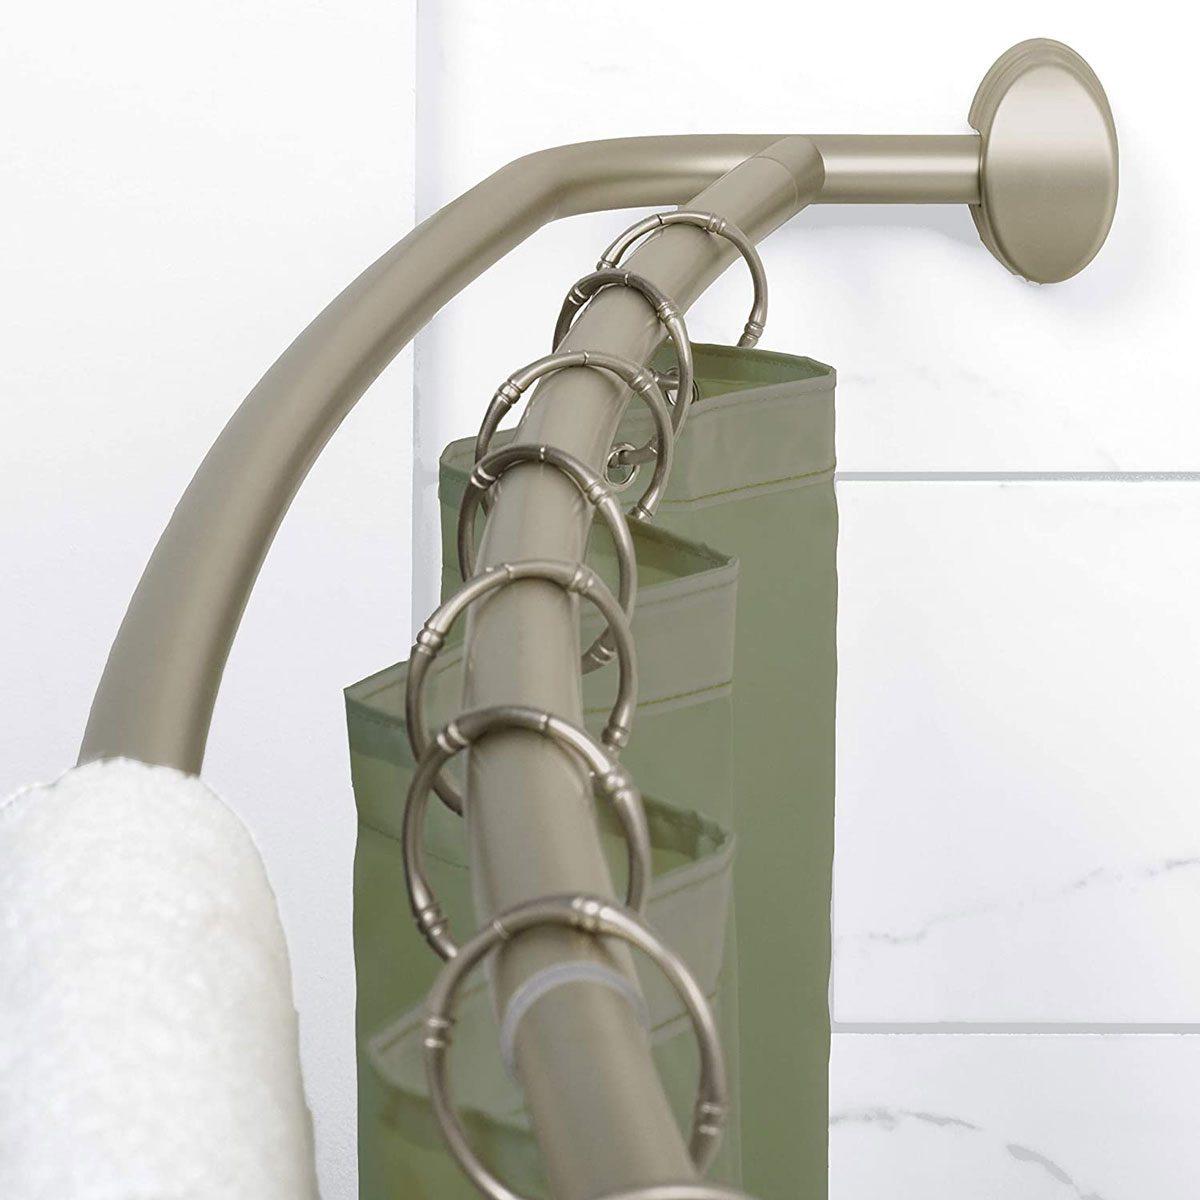 Double shower rod